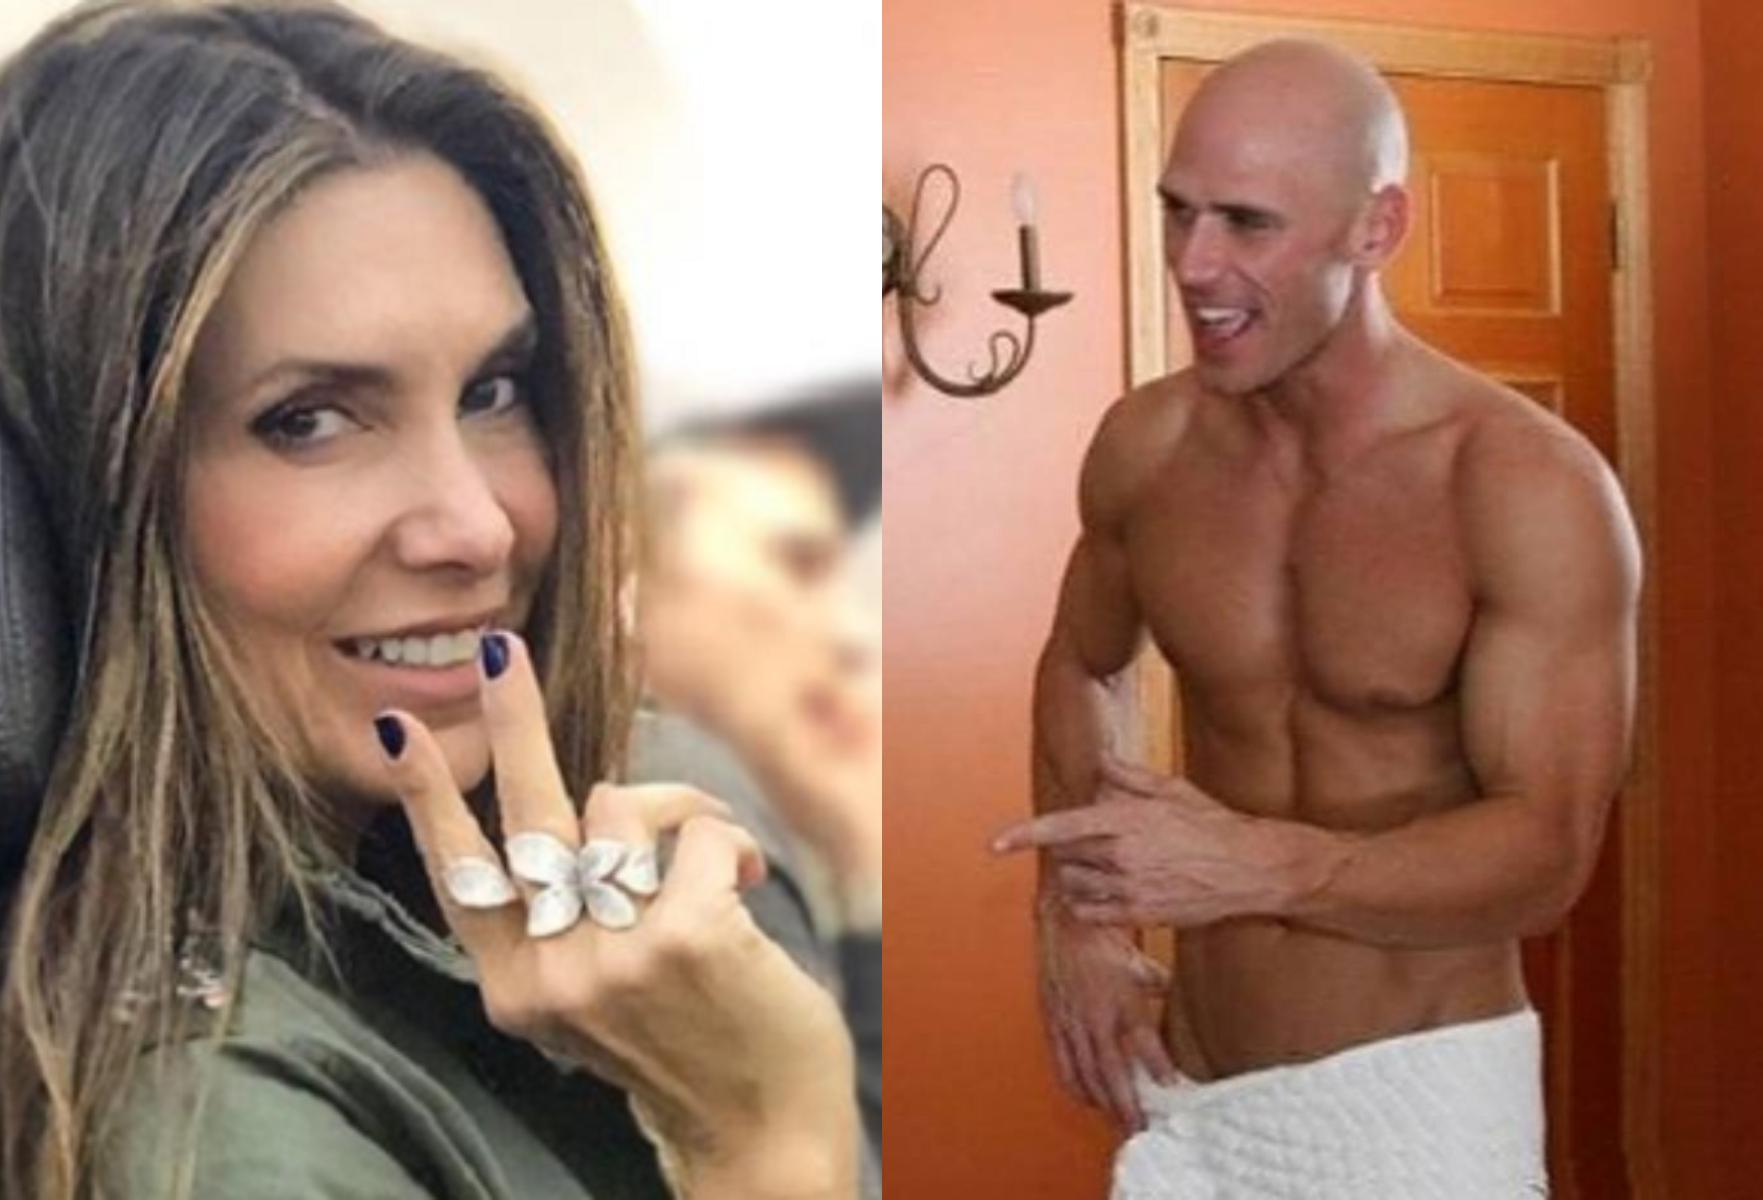 Actoresw Porno qué pena! ana karina manco confundió a este famoso actor